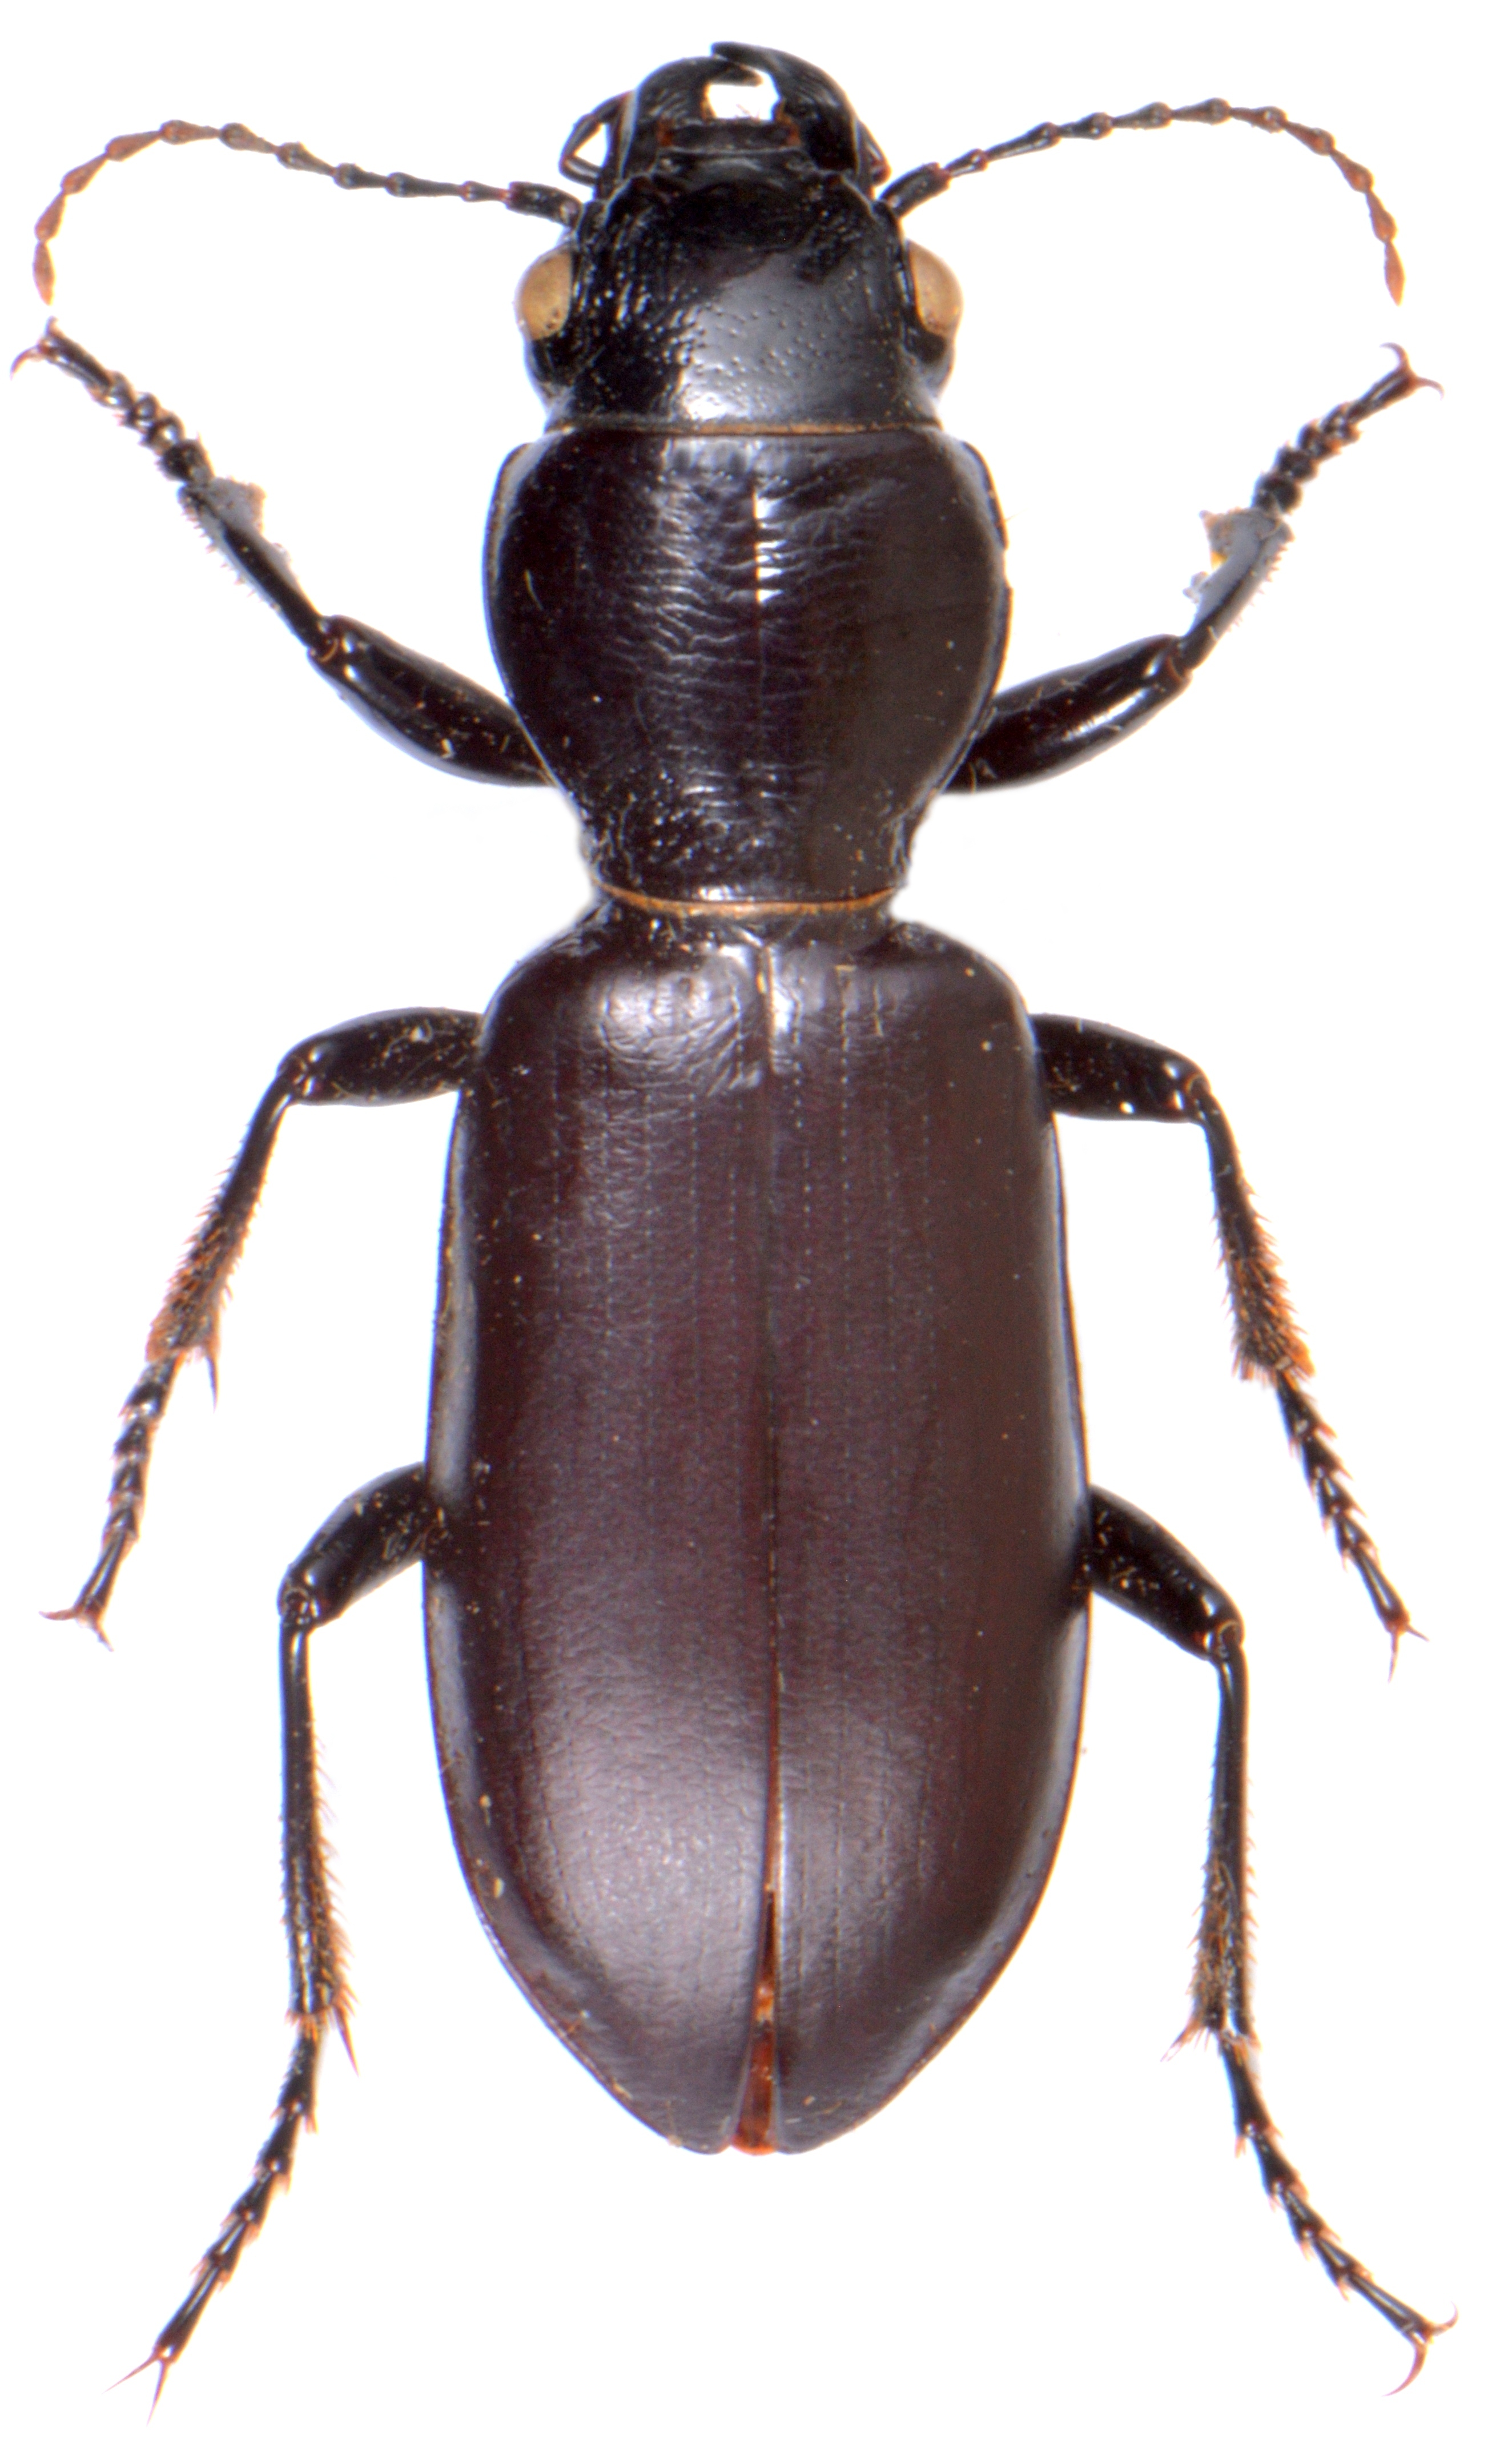 Broscus cephalotes 1